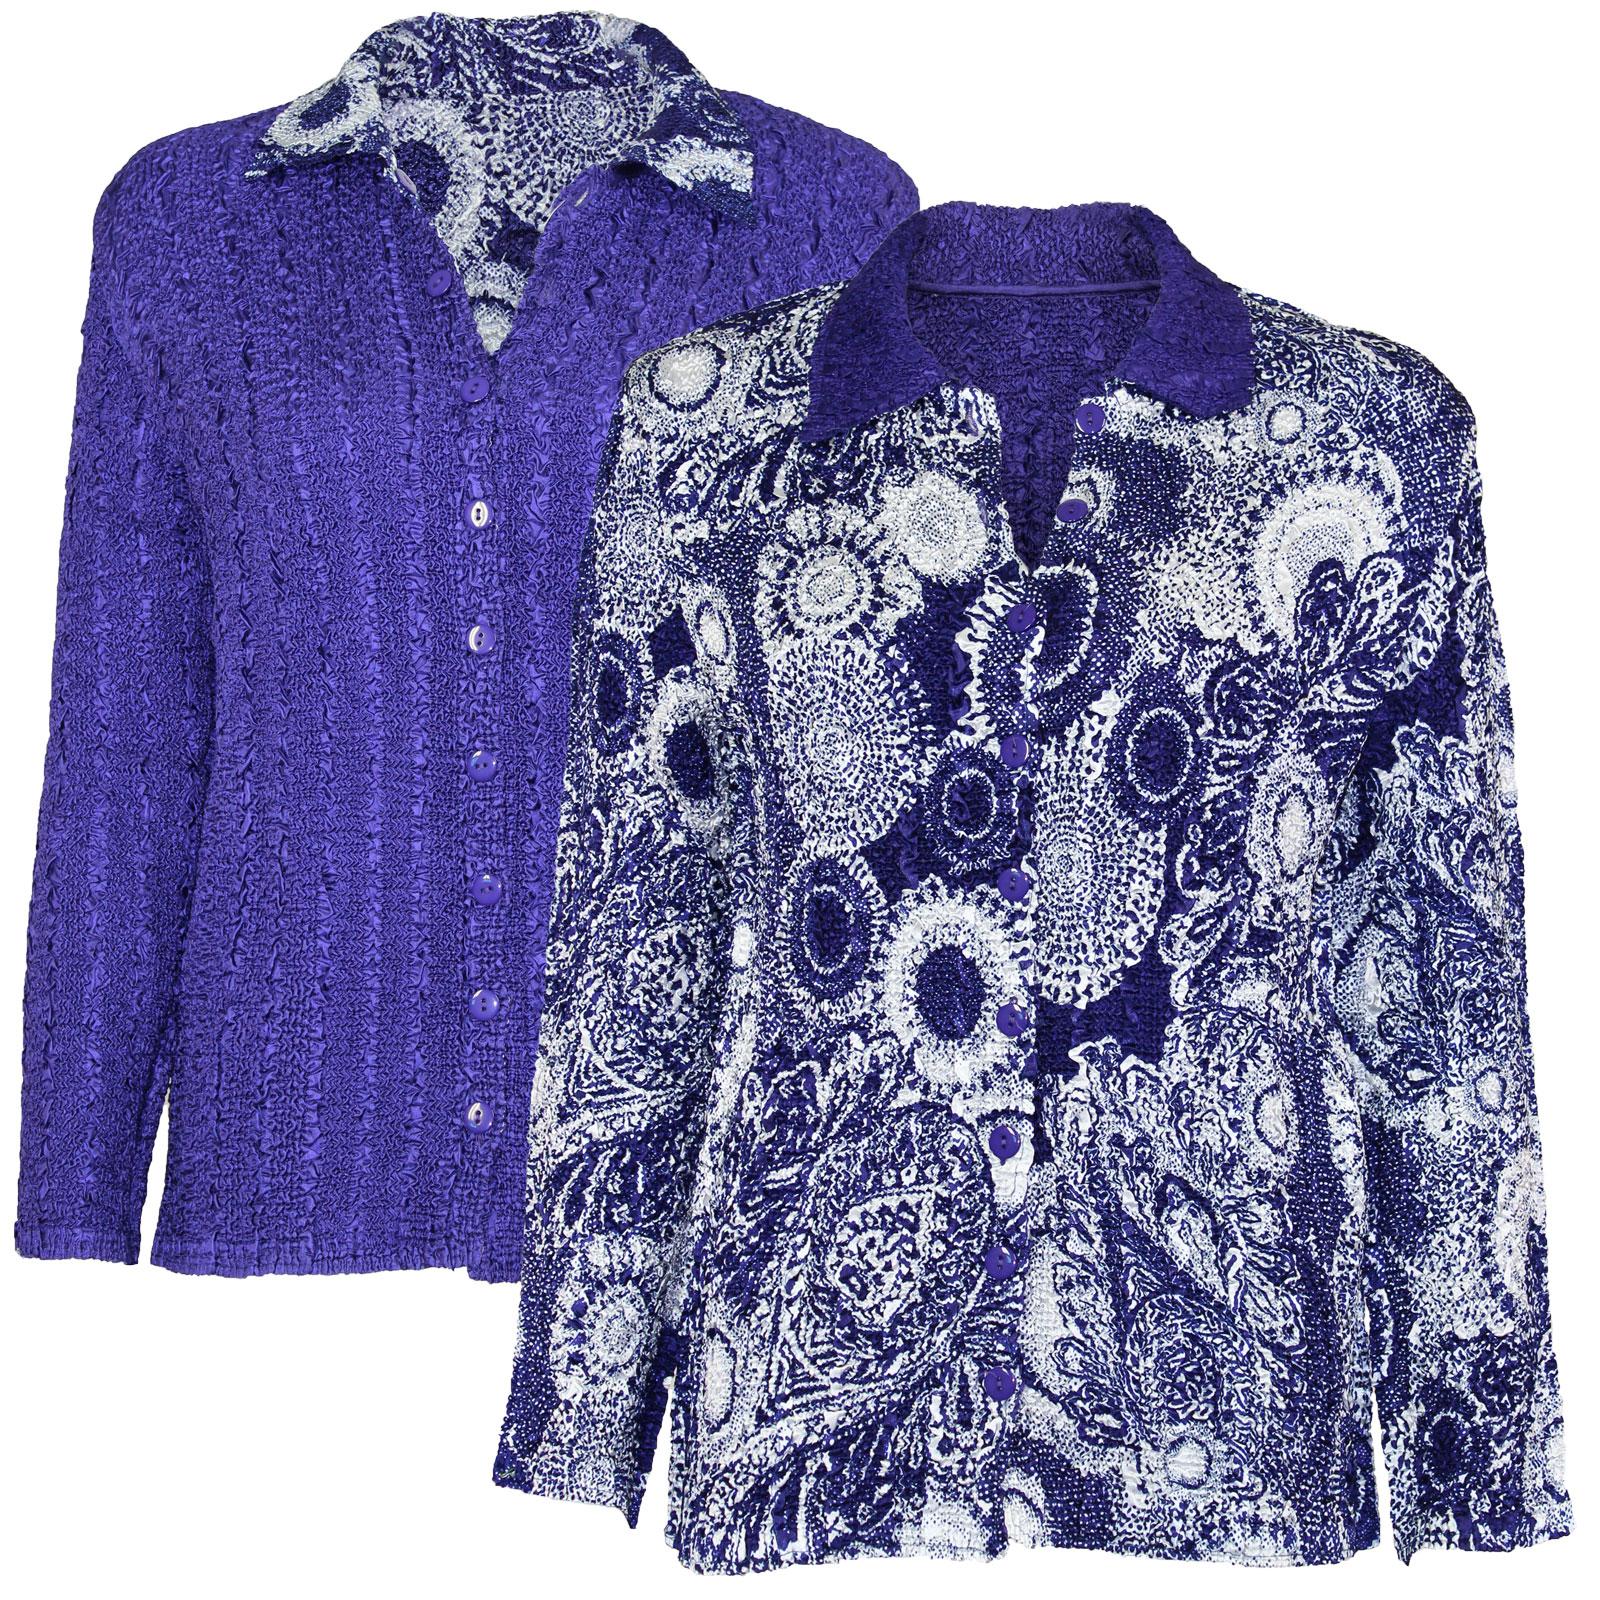 Wholesale Magic Crush - Reversible Jackets #14017 - S-M